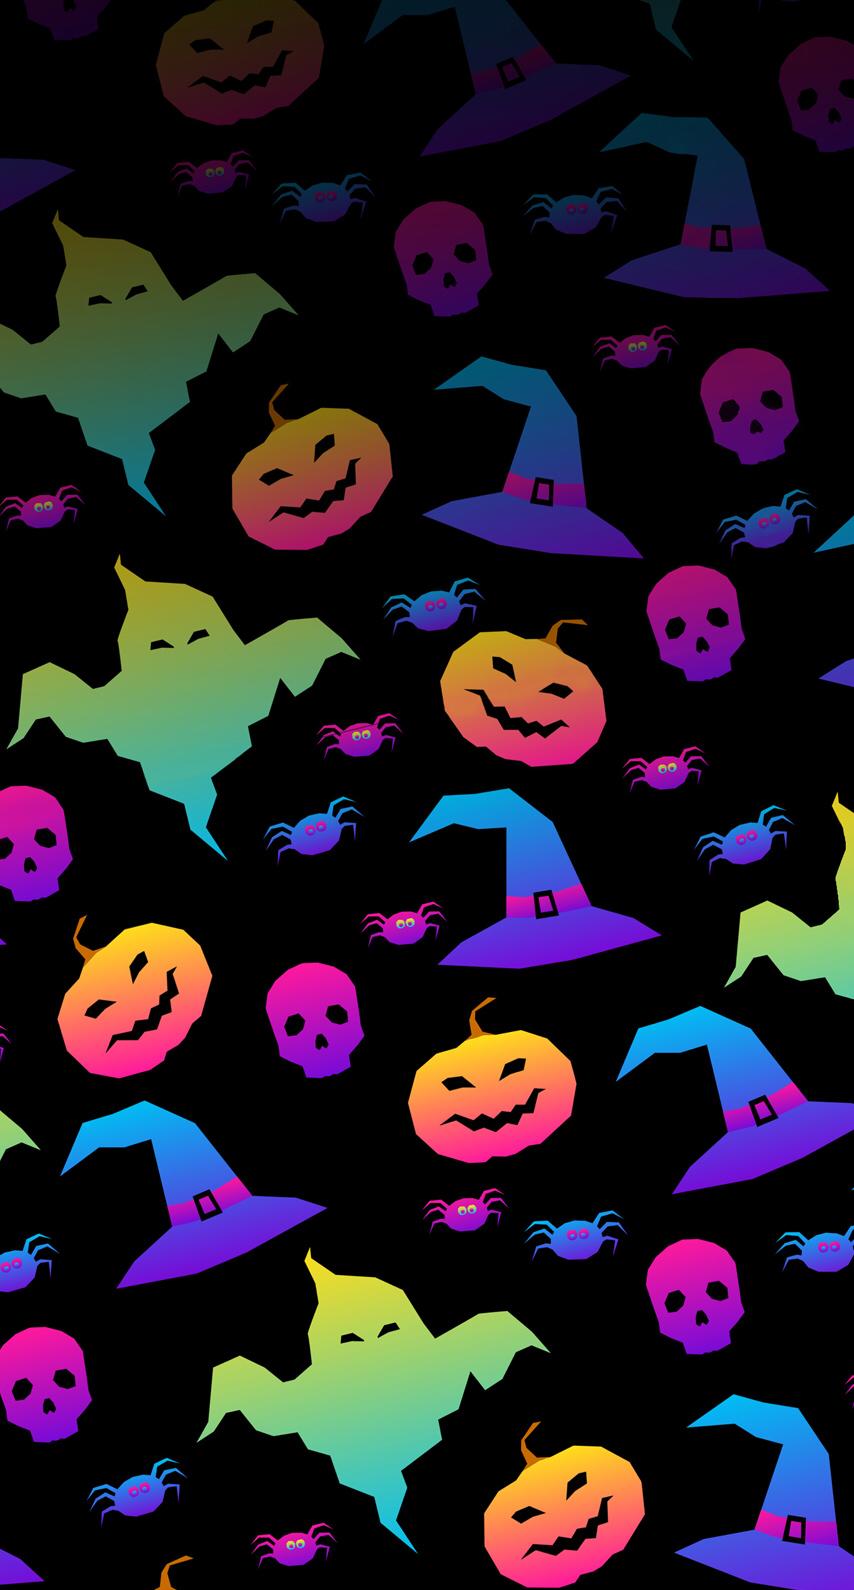 Fondos De Halloween Fondos De Halloween Fondo De Pantalla Halloween Pantallas De Halloween